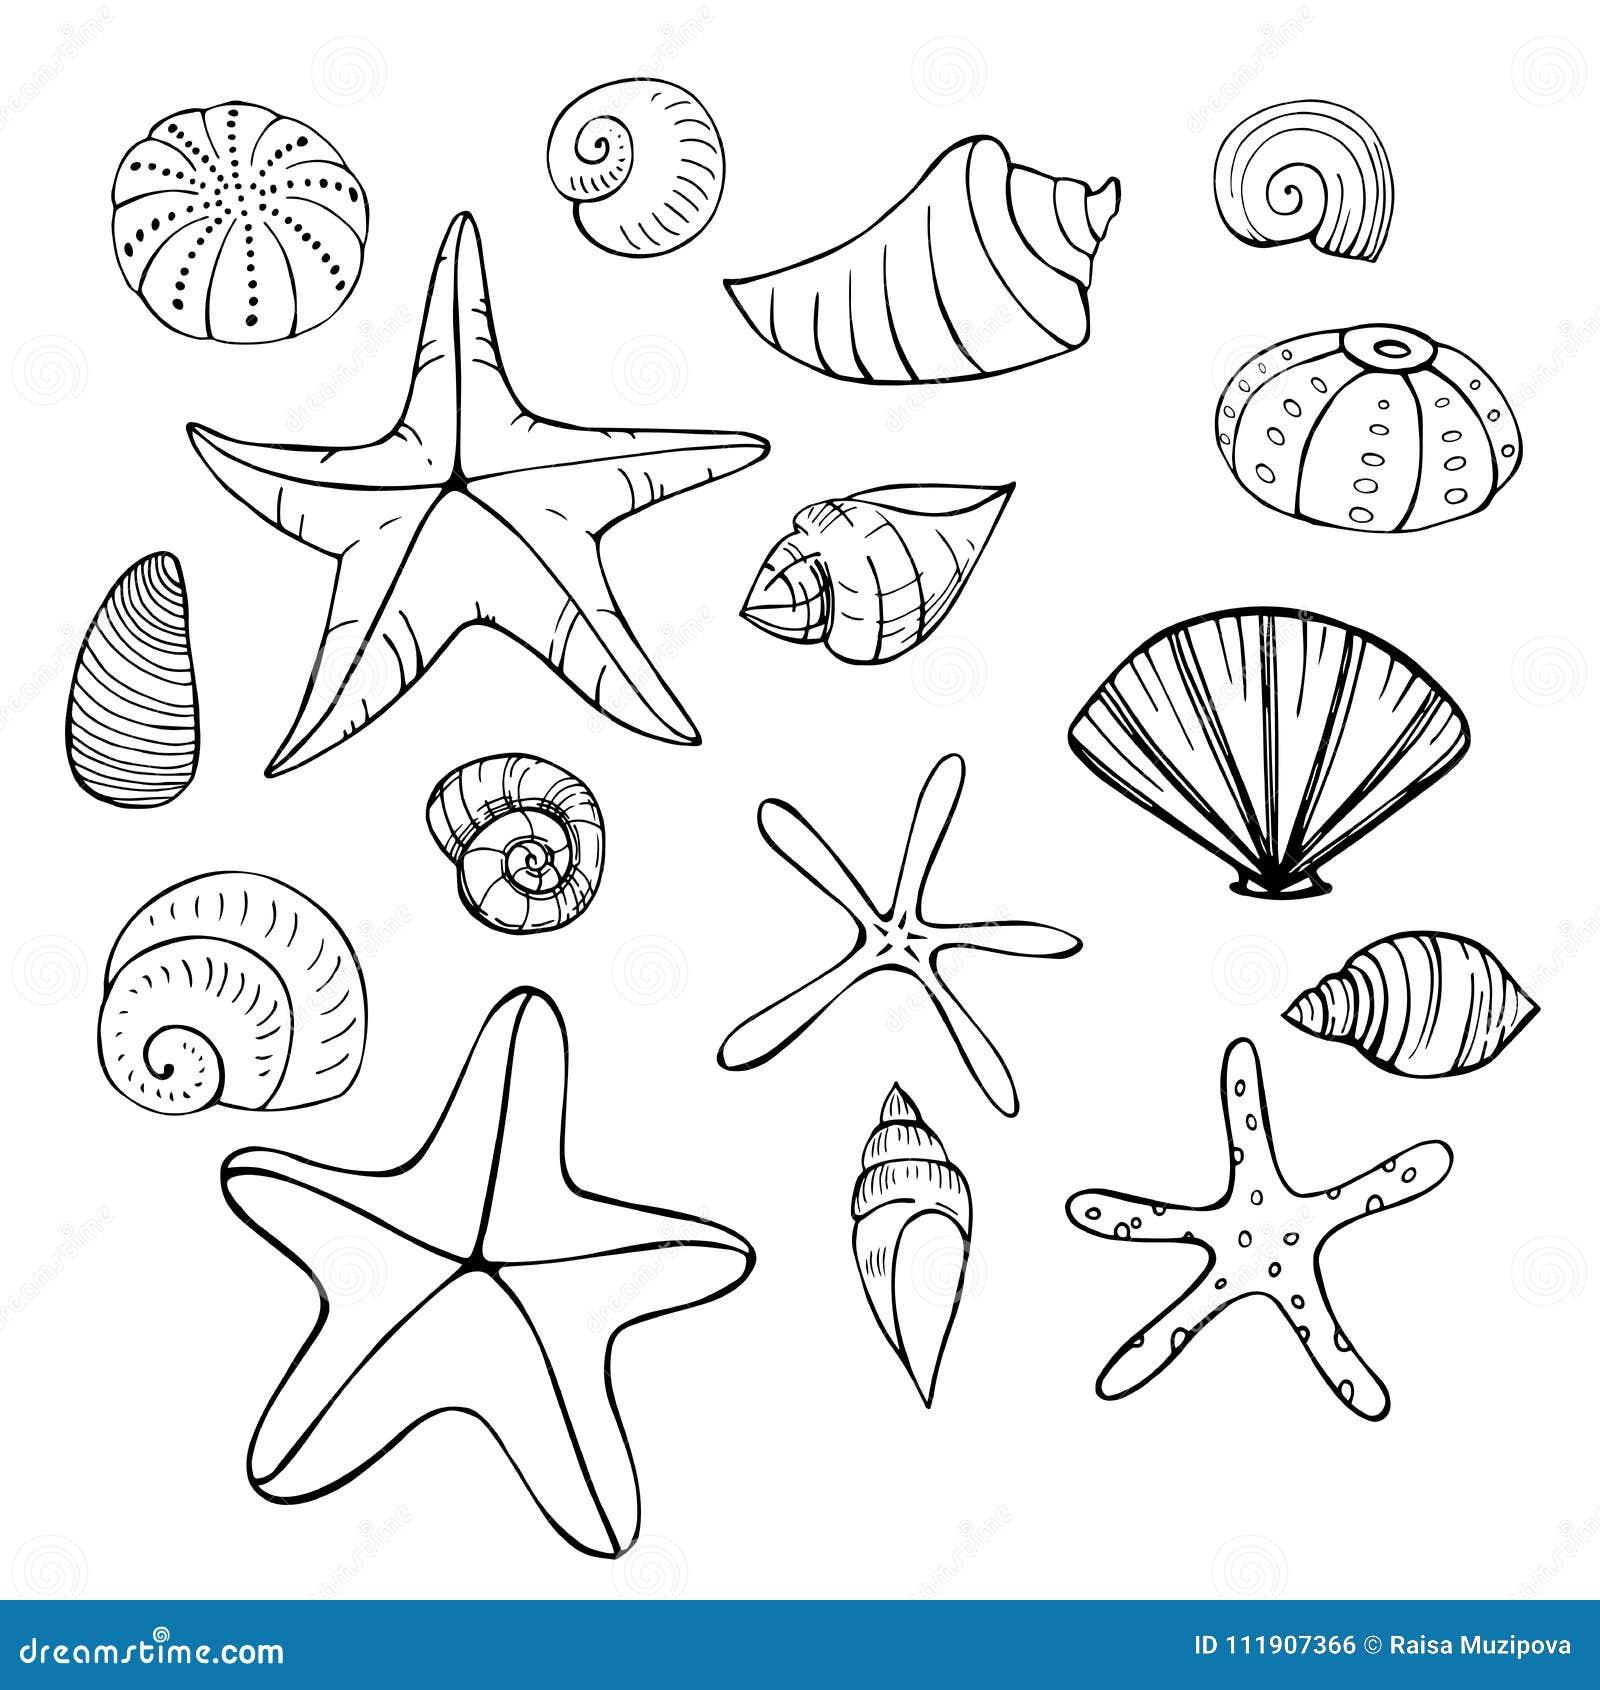 starfish and seashells vector sketch illustration stock vector